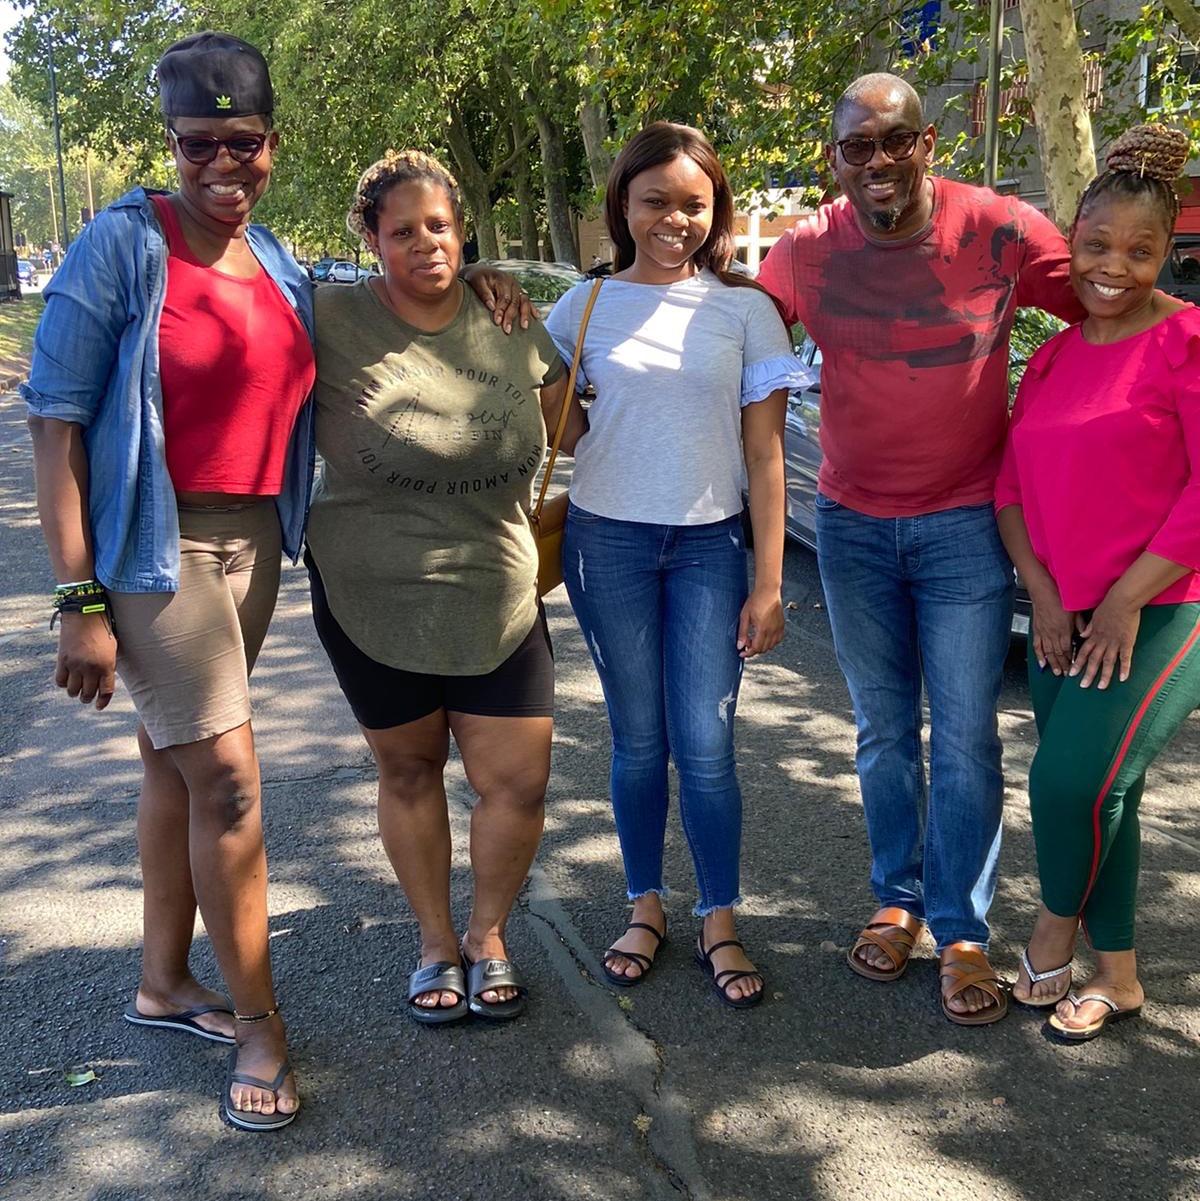 Evangelism with fun 💃🏼💃🏼💃🏼 #OneMillionRhapso